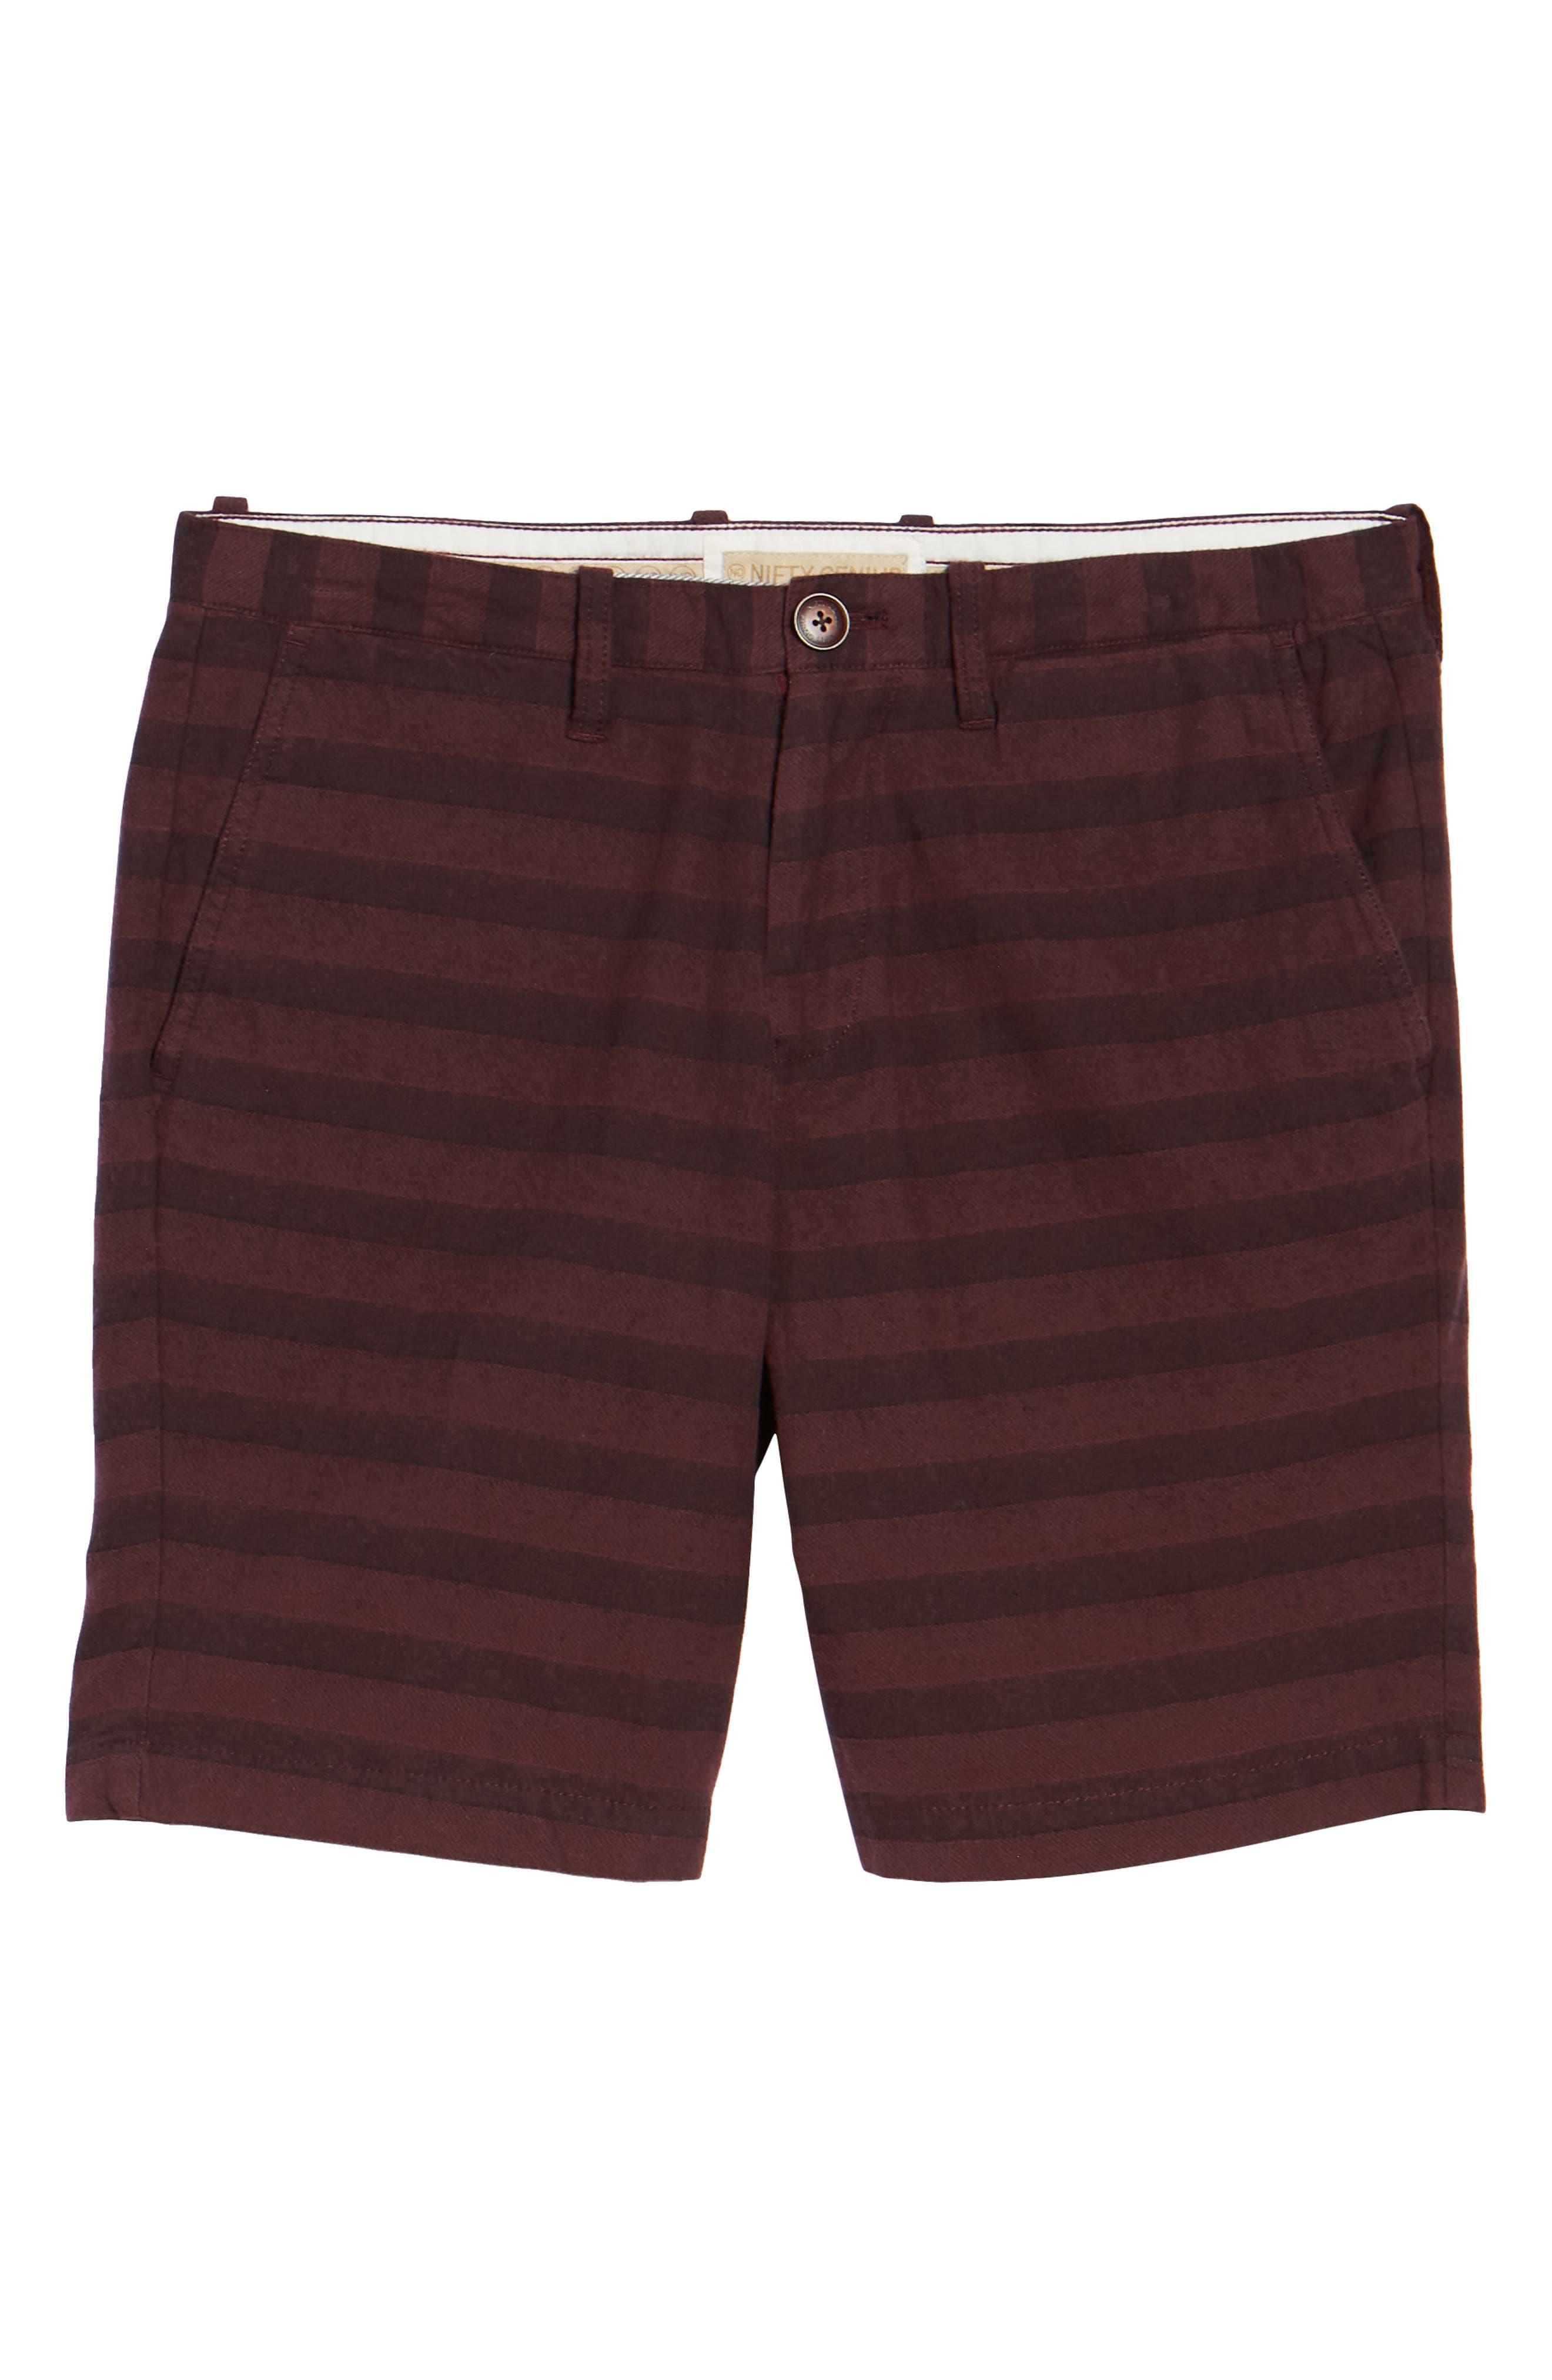 Morgan Stripe Bermuda Shorts,                             Alternate thumbnail 6, color,                             Burgundy